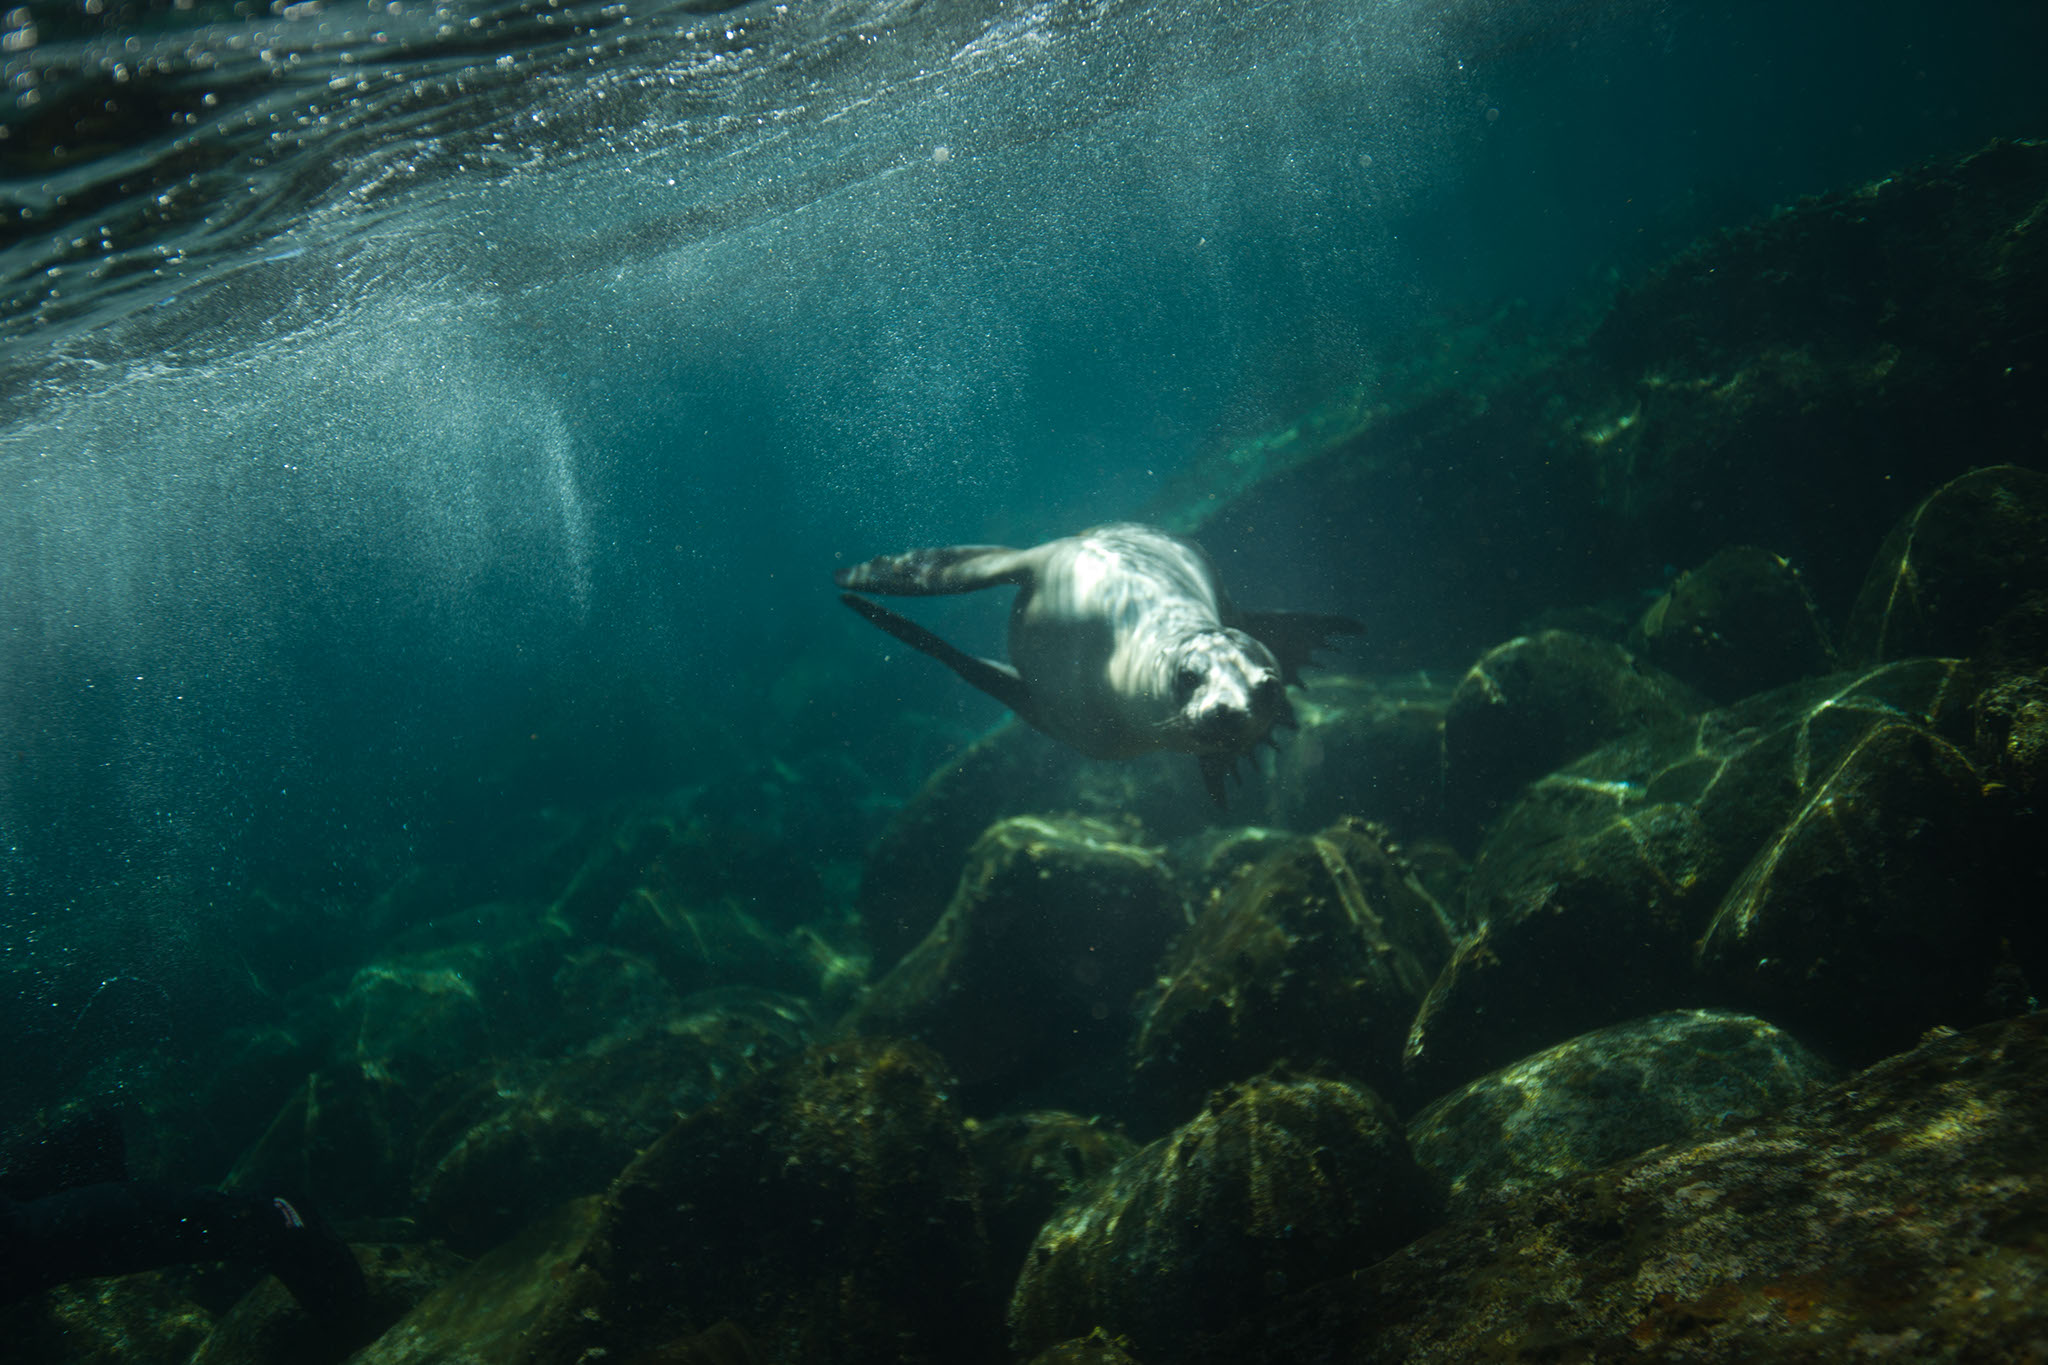 TimWatters-Underwater-06.jpg